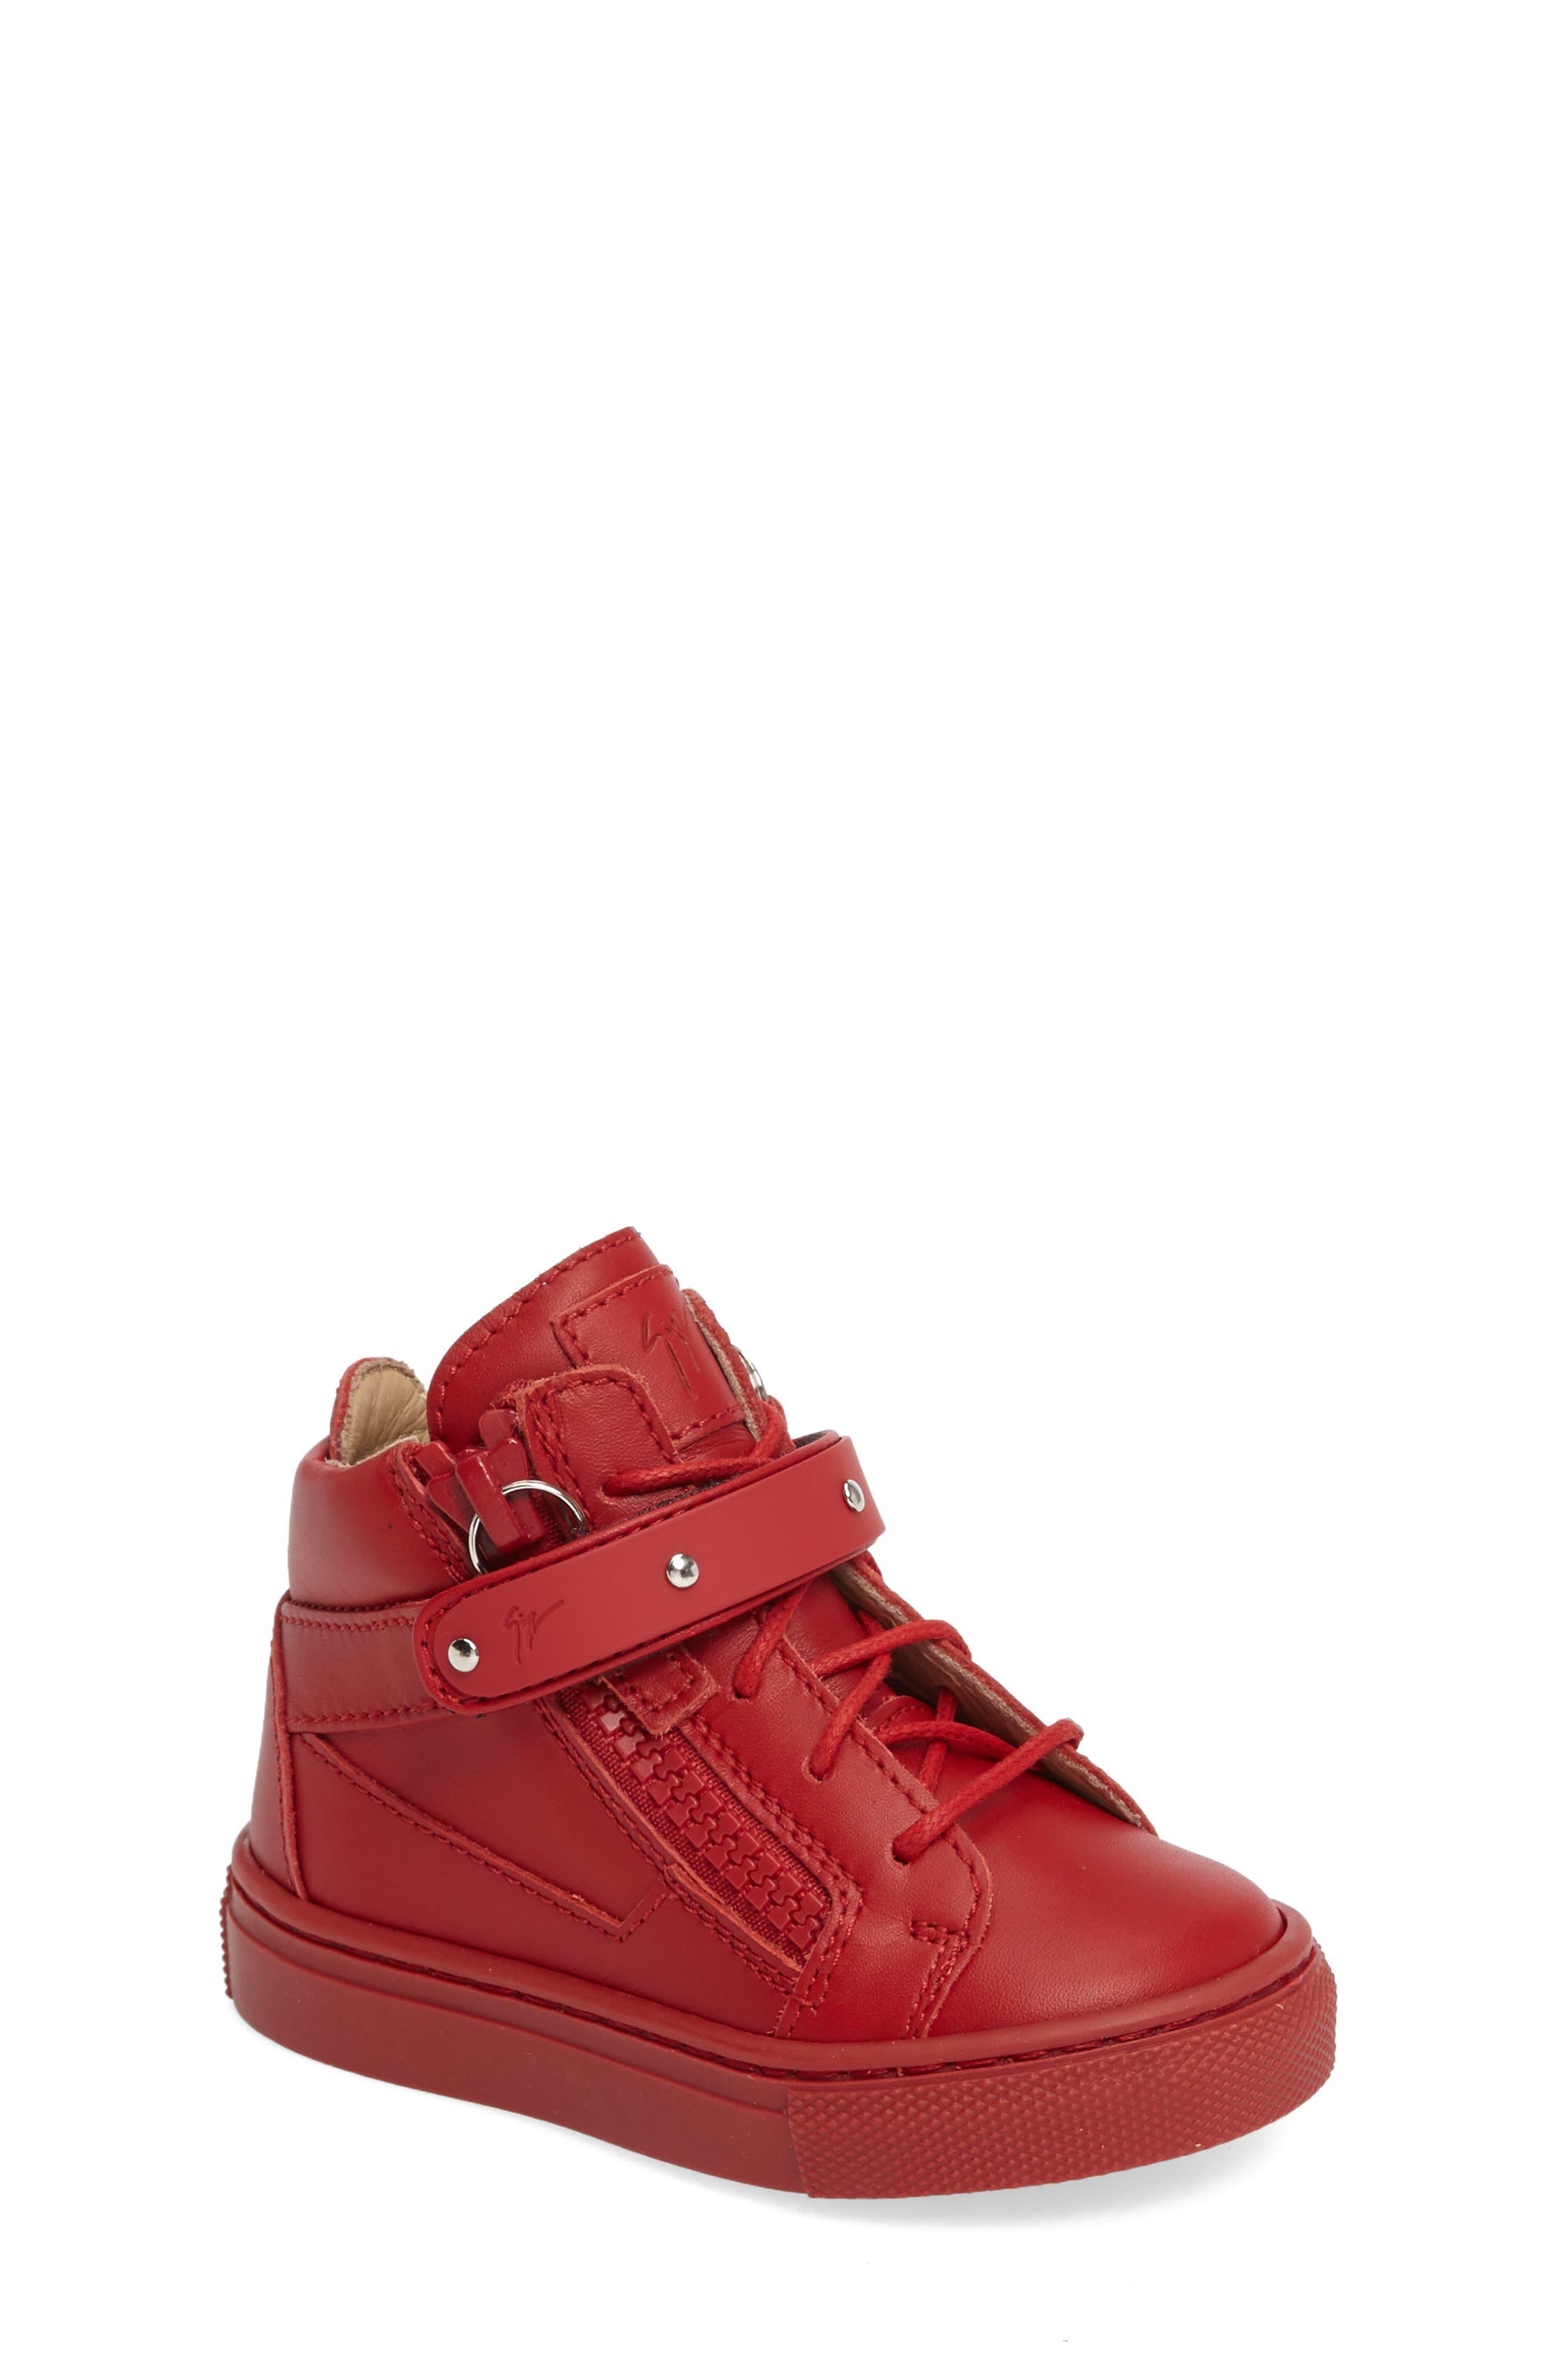 Giuseppe Zanotti Taylor Junior High Top Sneaker Baby